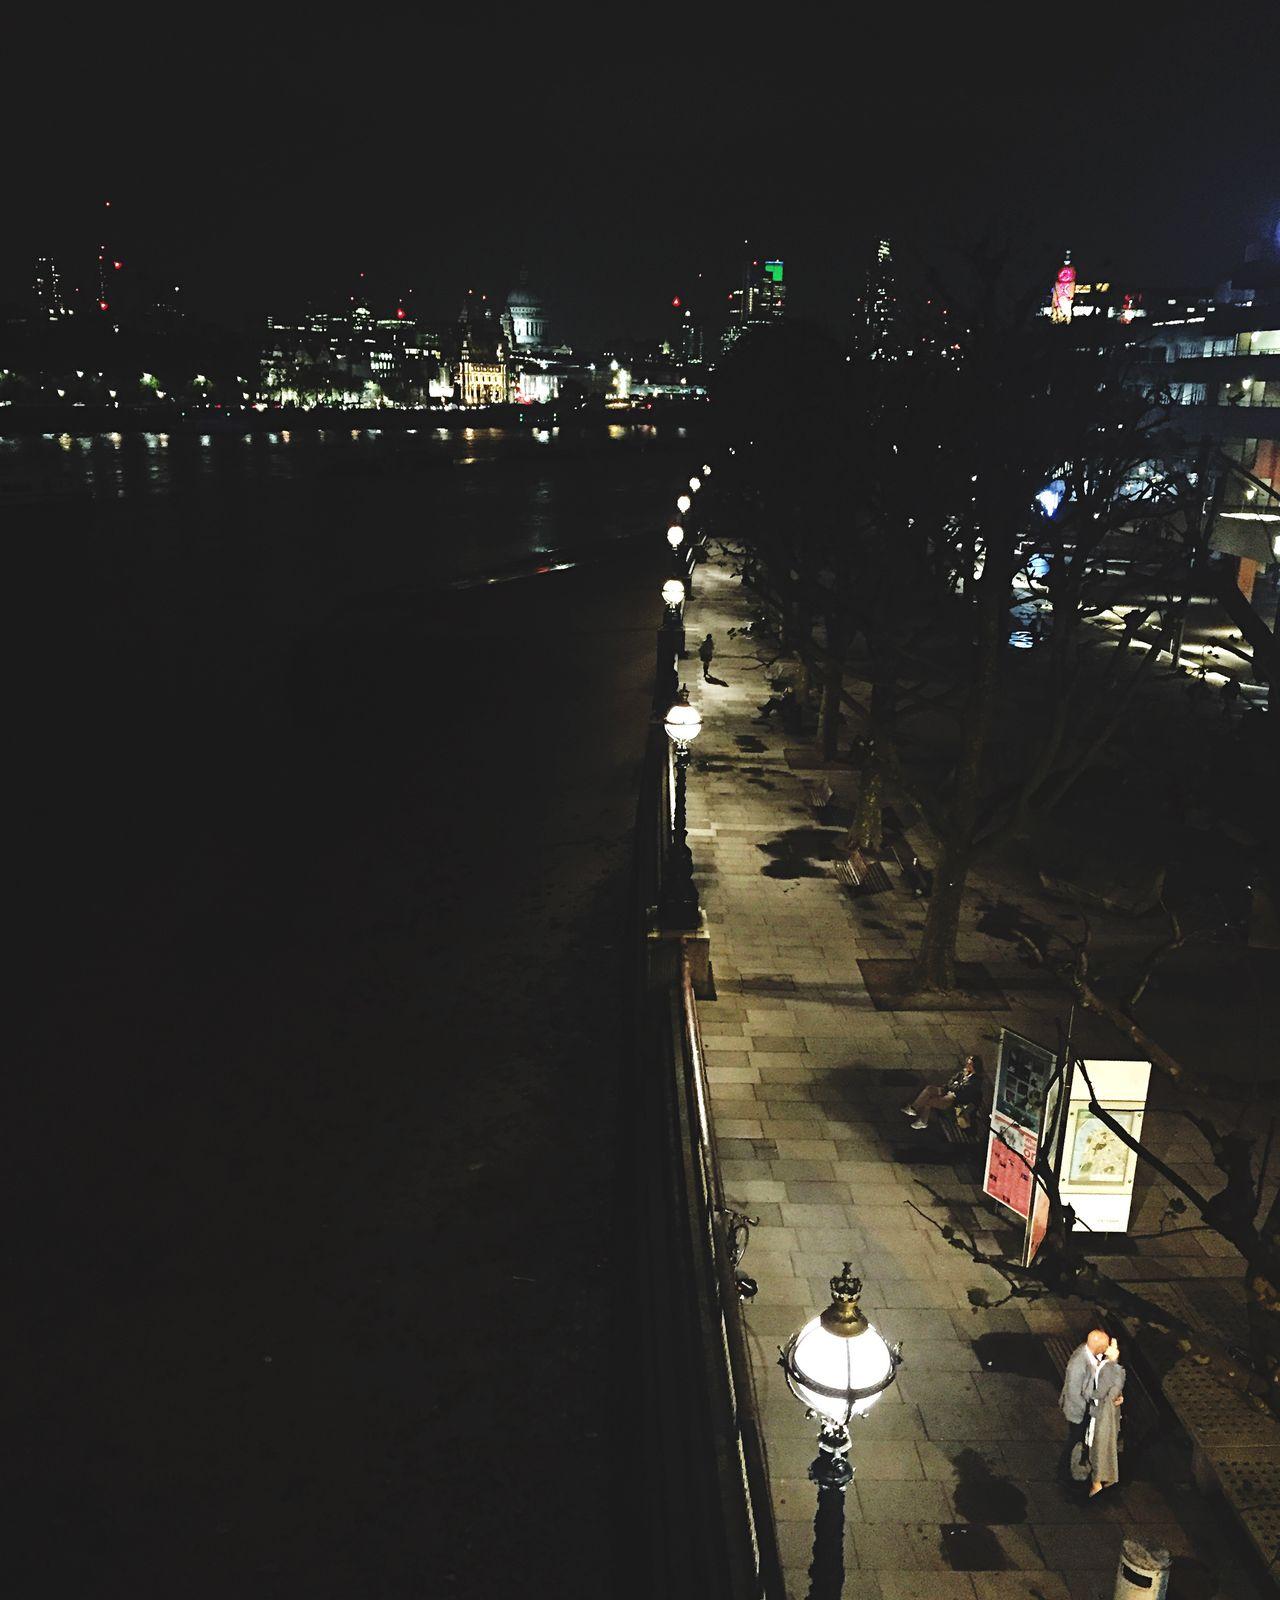 Look Closer Love Partner City Lights London Ecstasy Excitement Night Street Bridge London Bridge A Bird's Eye View London Lifestyle